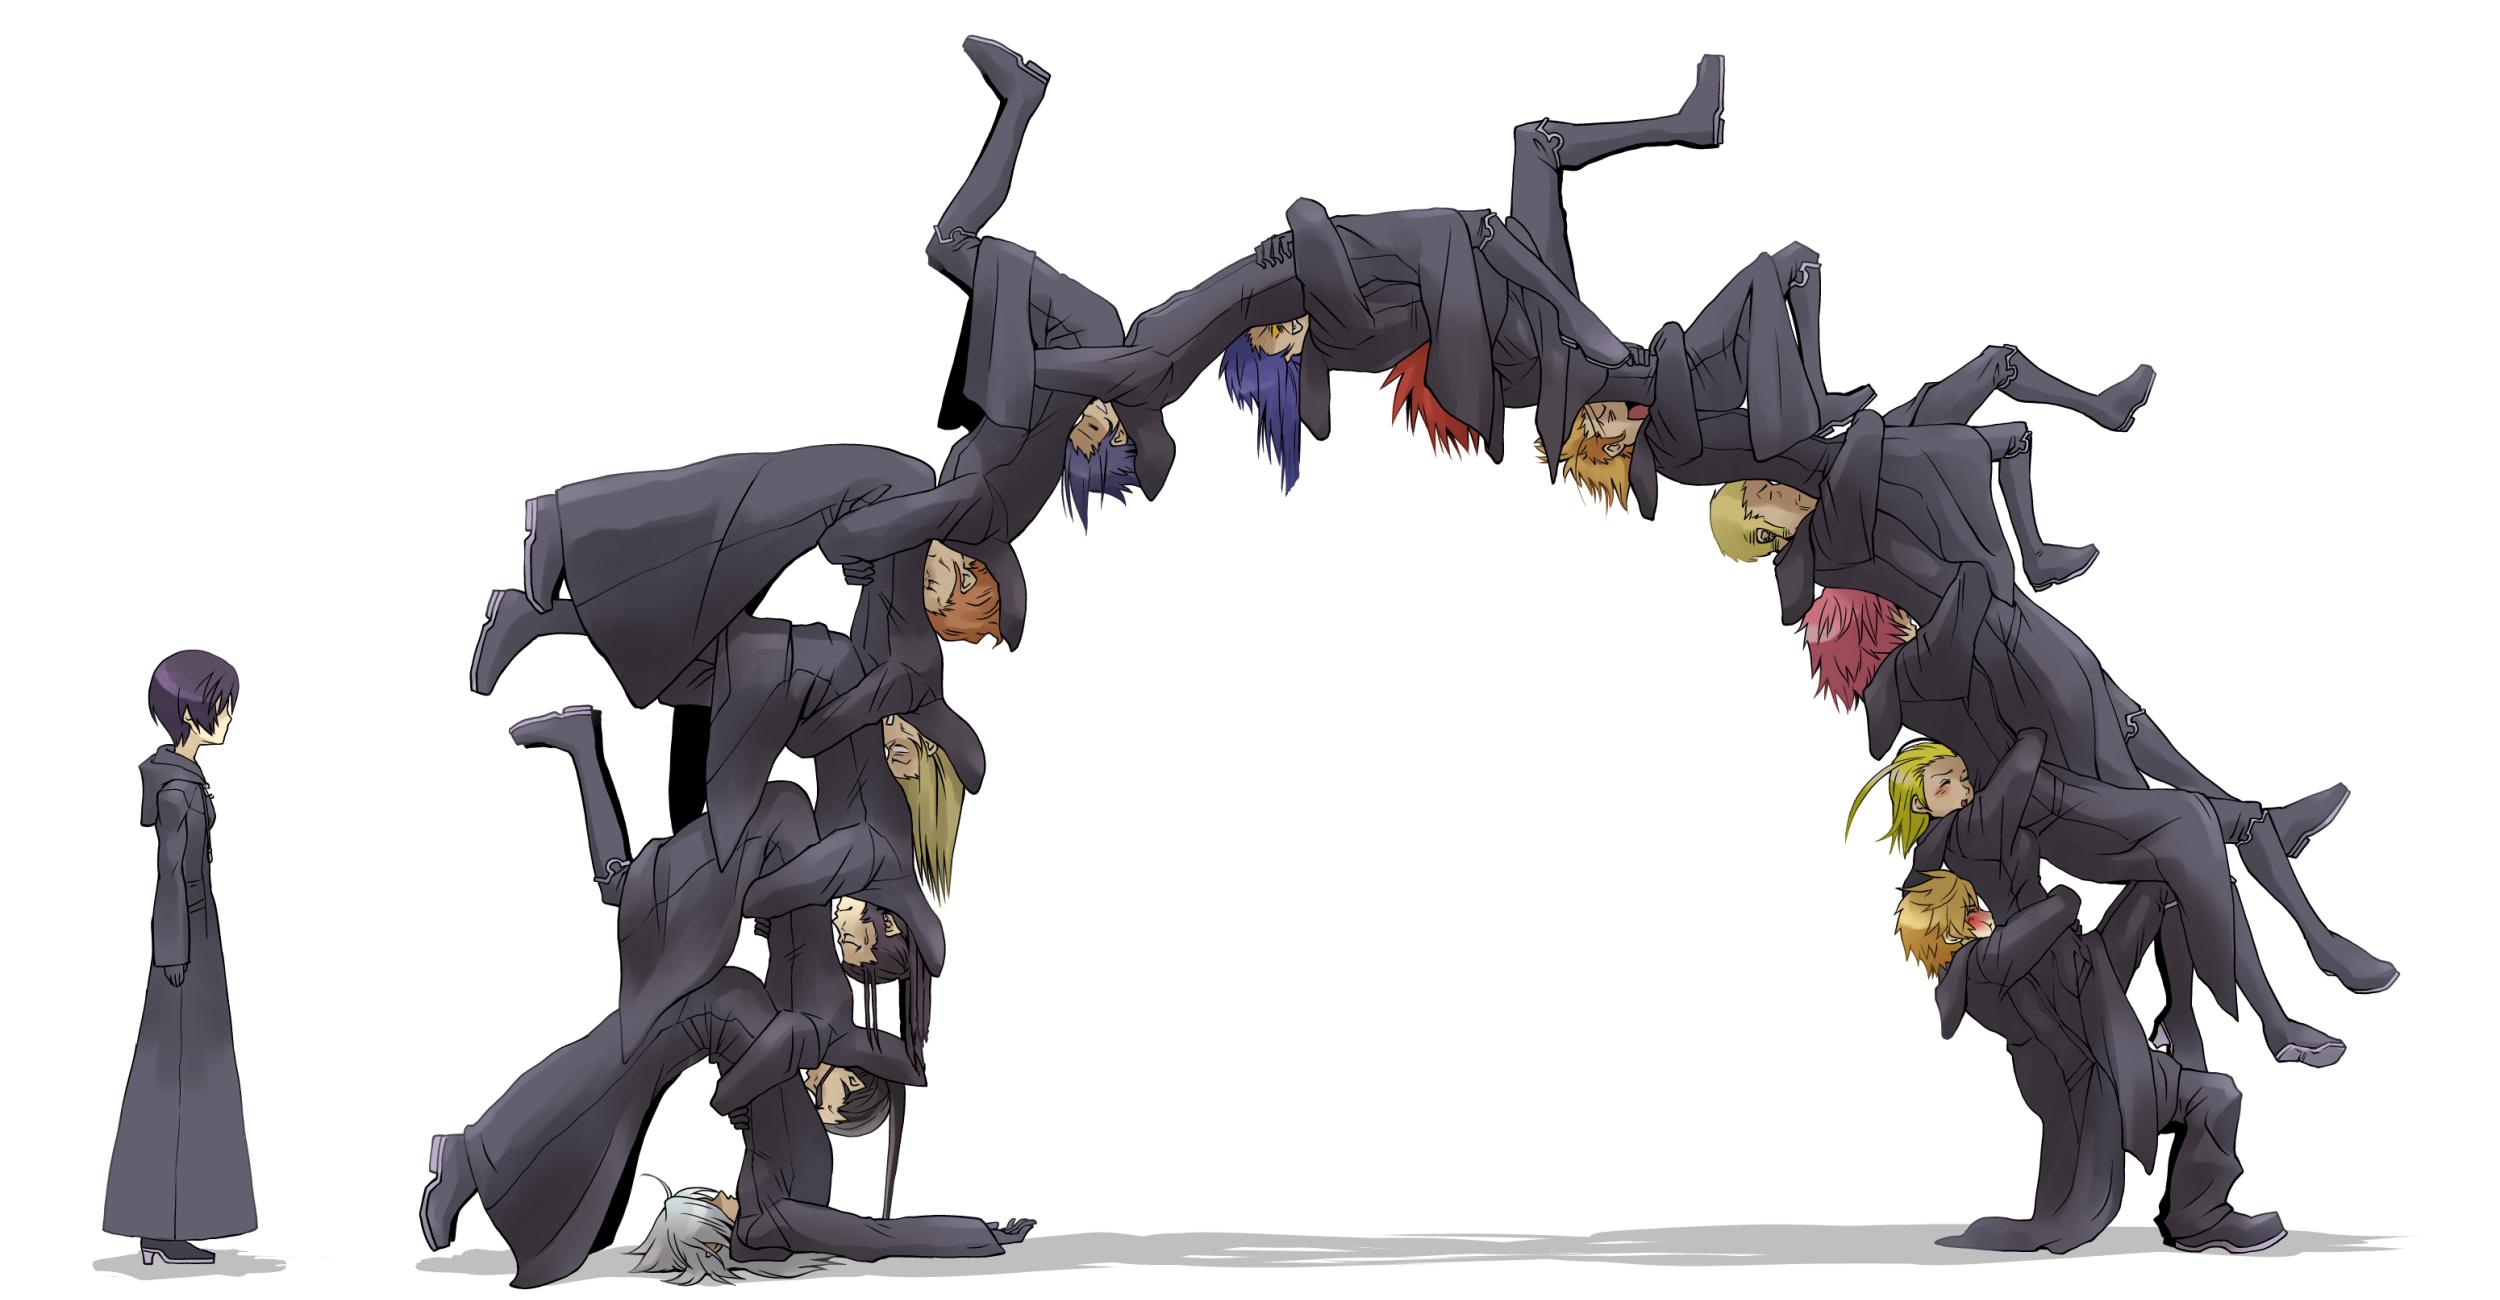 SaïxXemnas Kingdom Hearts  Works  Archive of Our Own